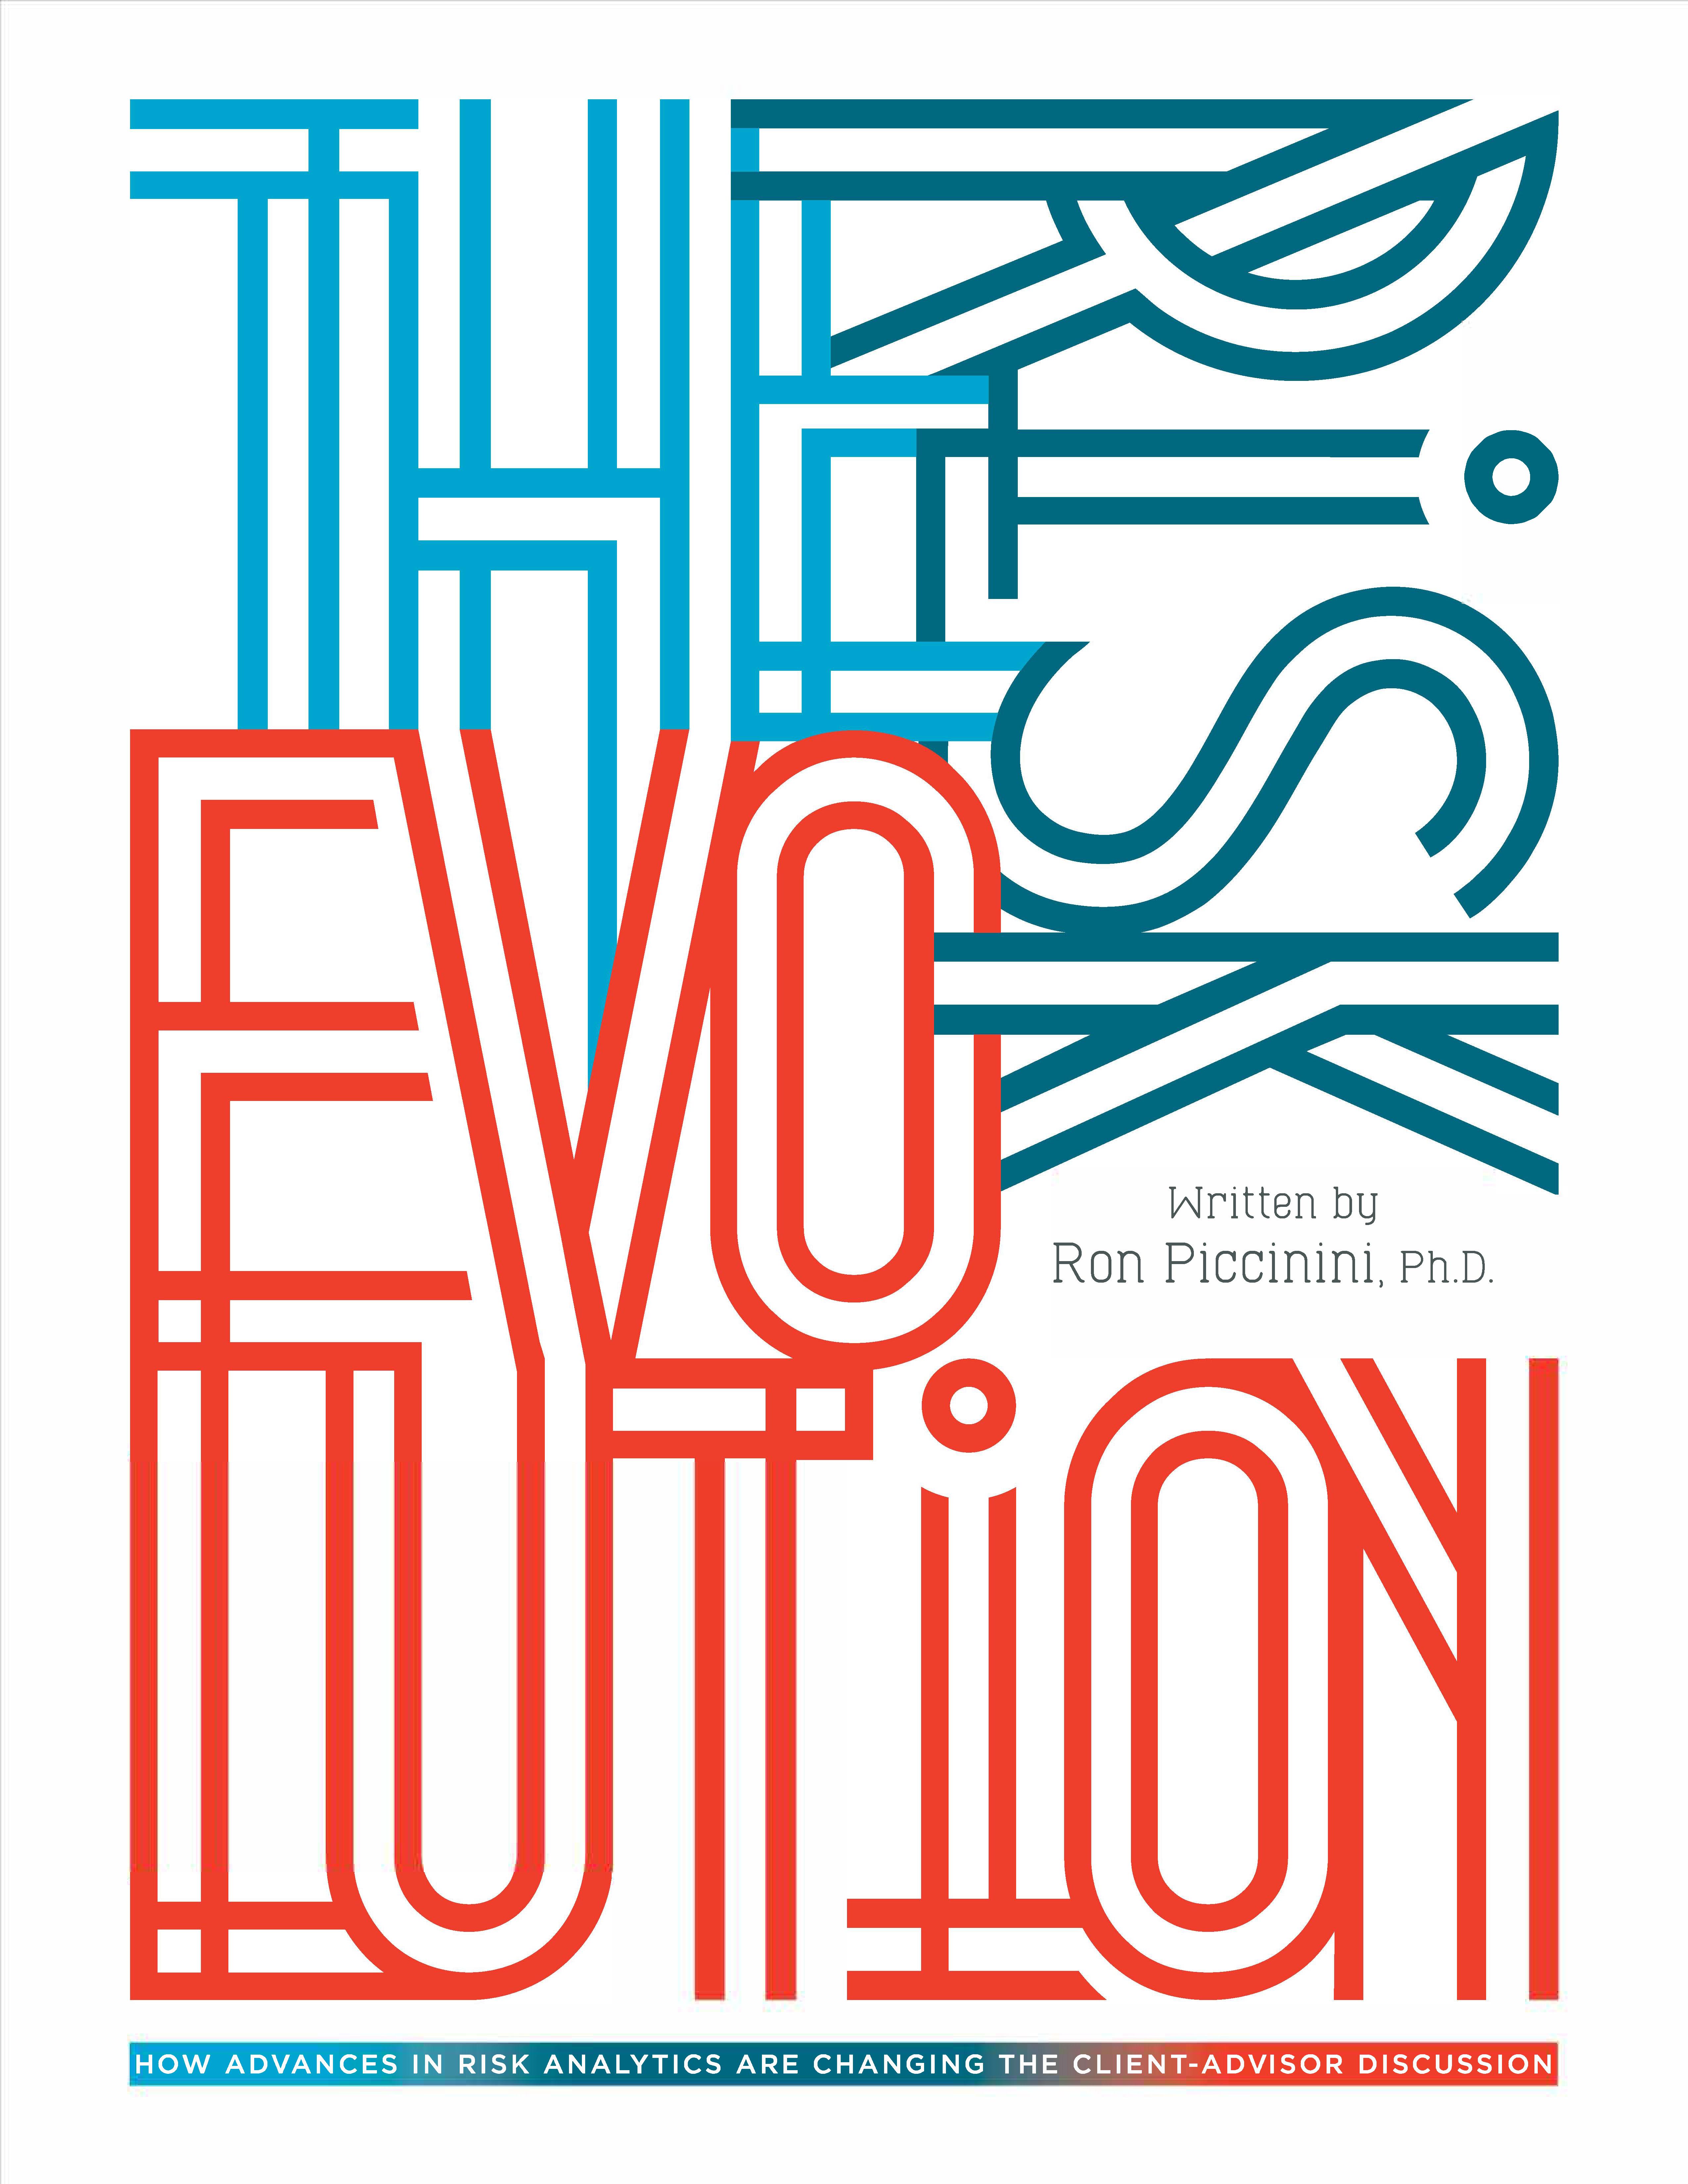 The Risk Evolution